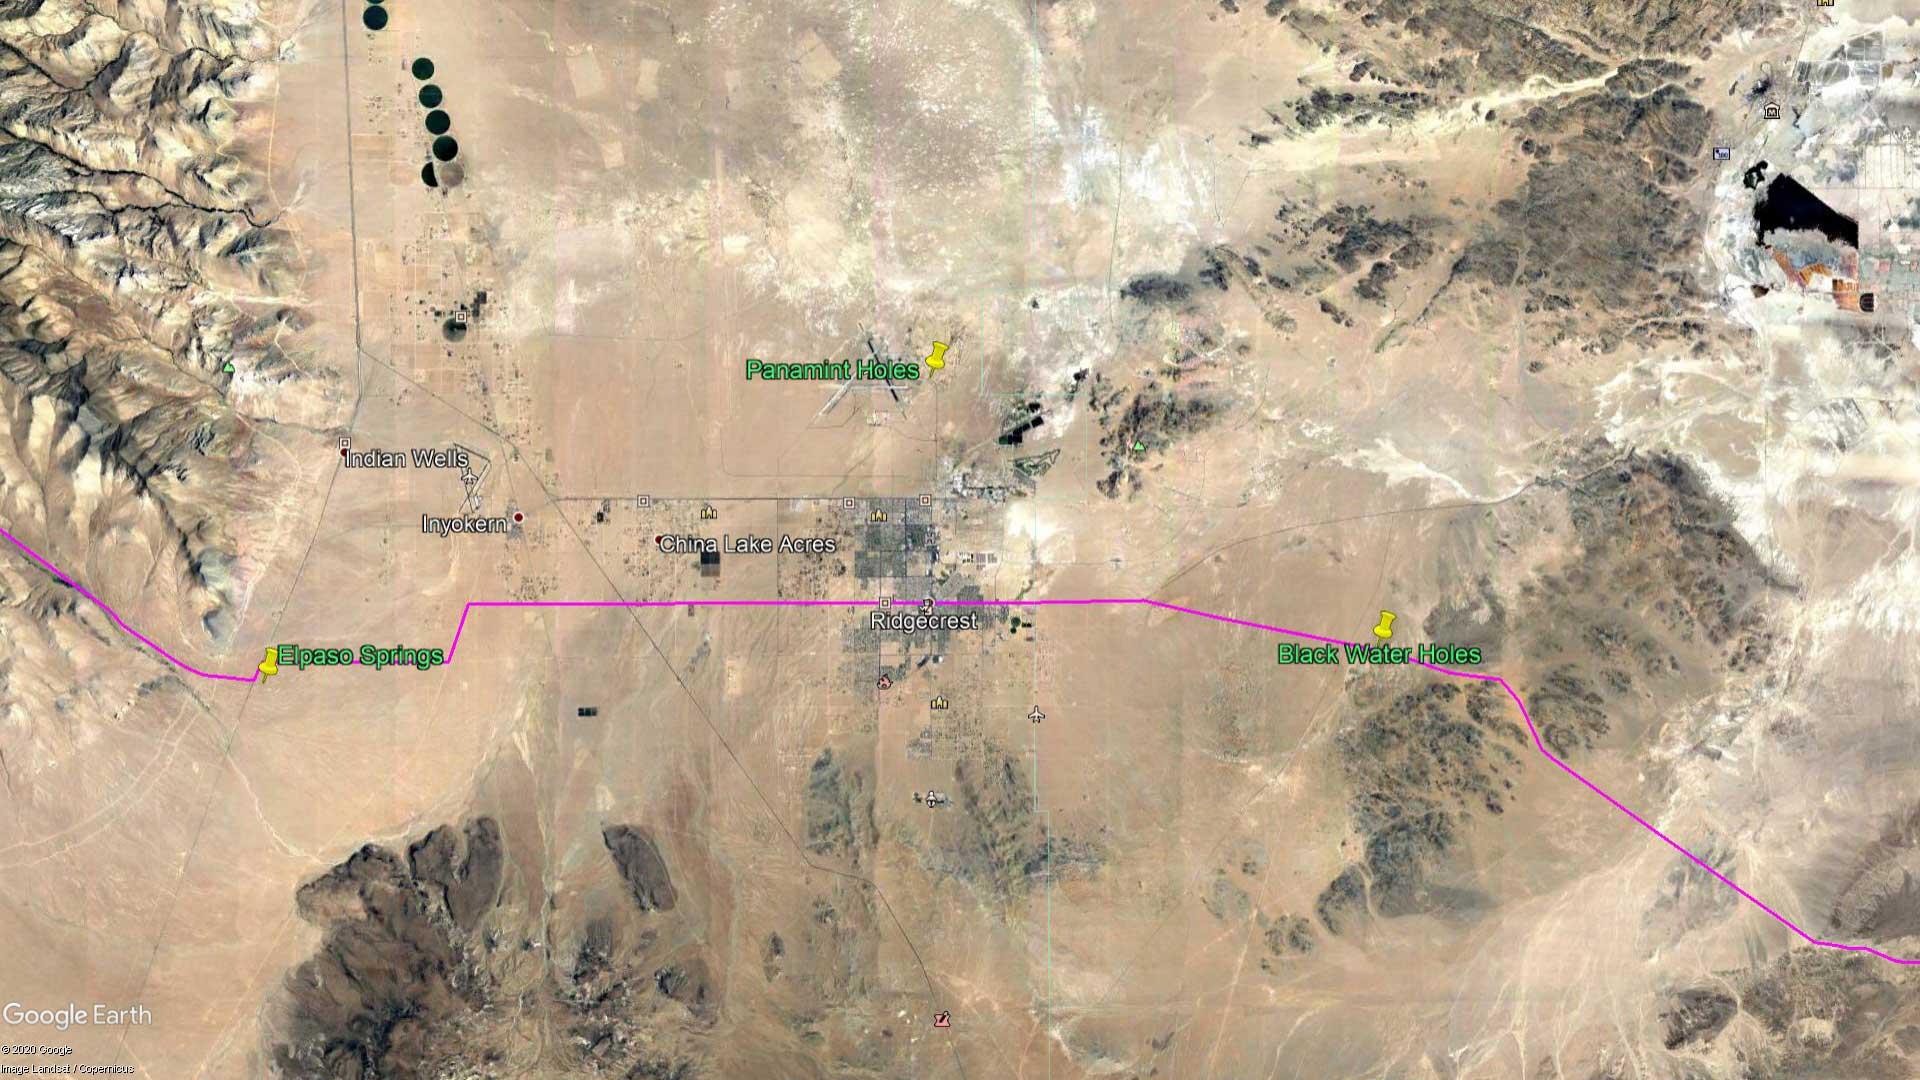 April 3, 1870 - The Mojave Desert